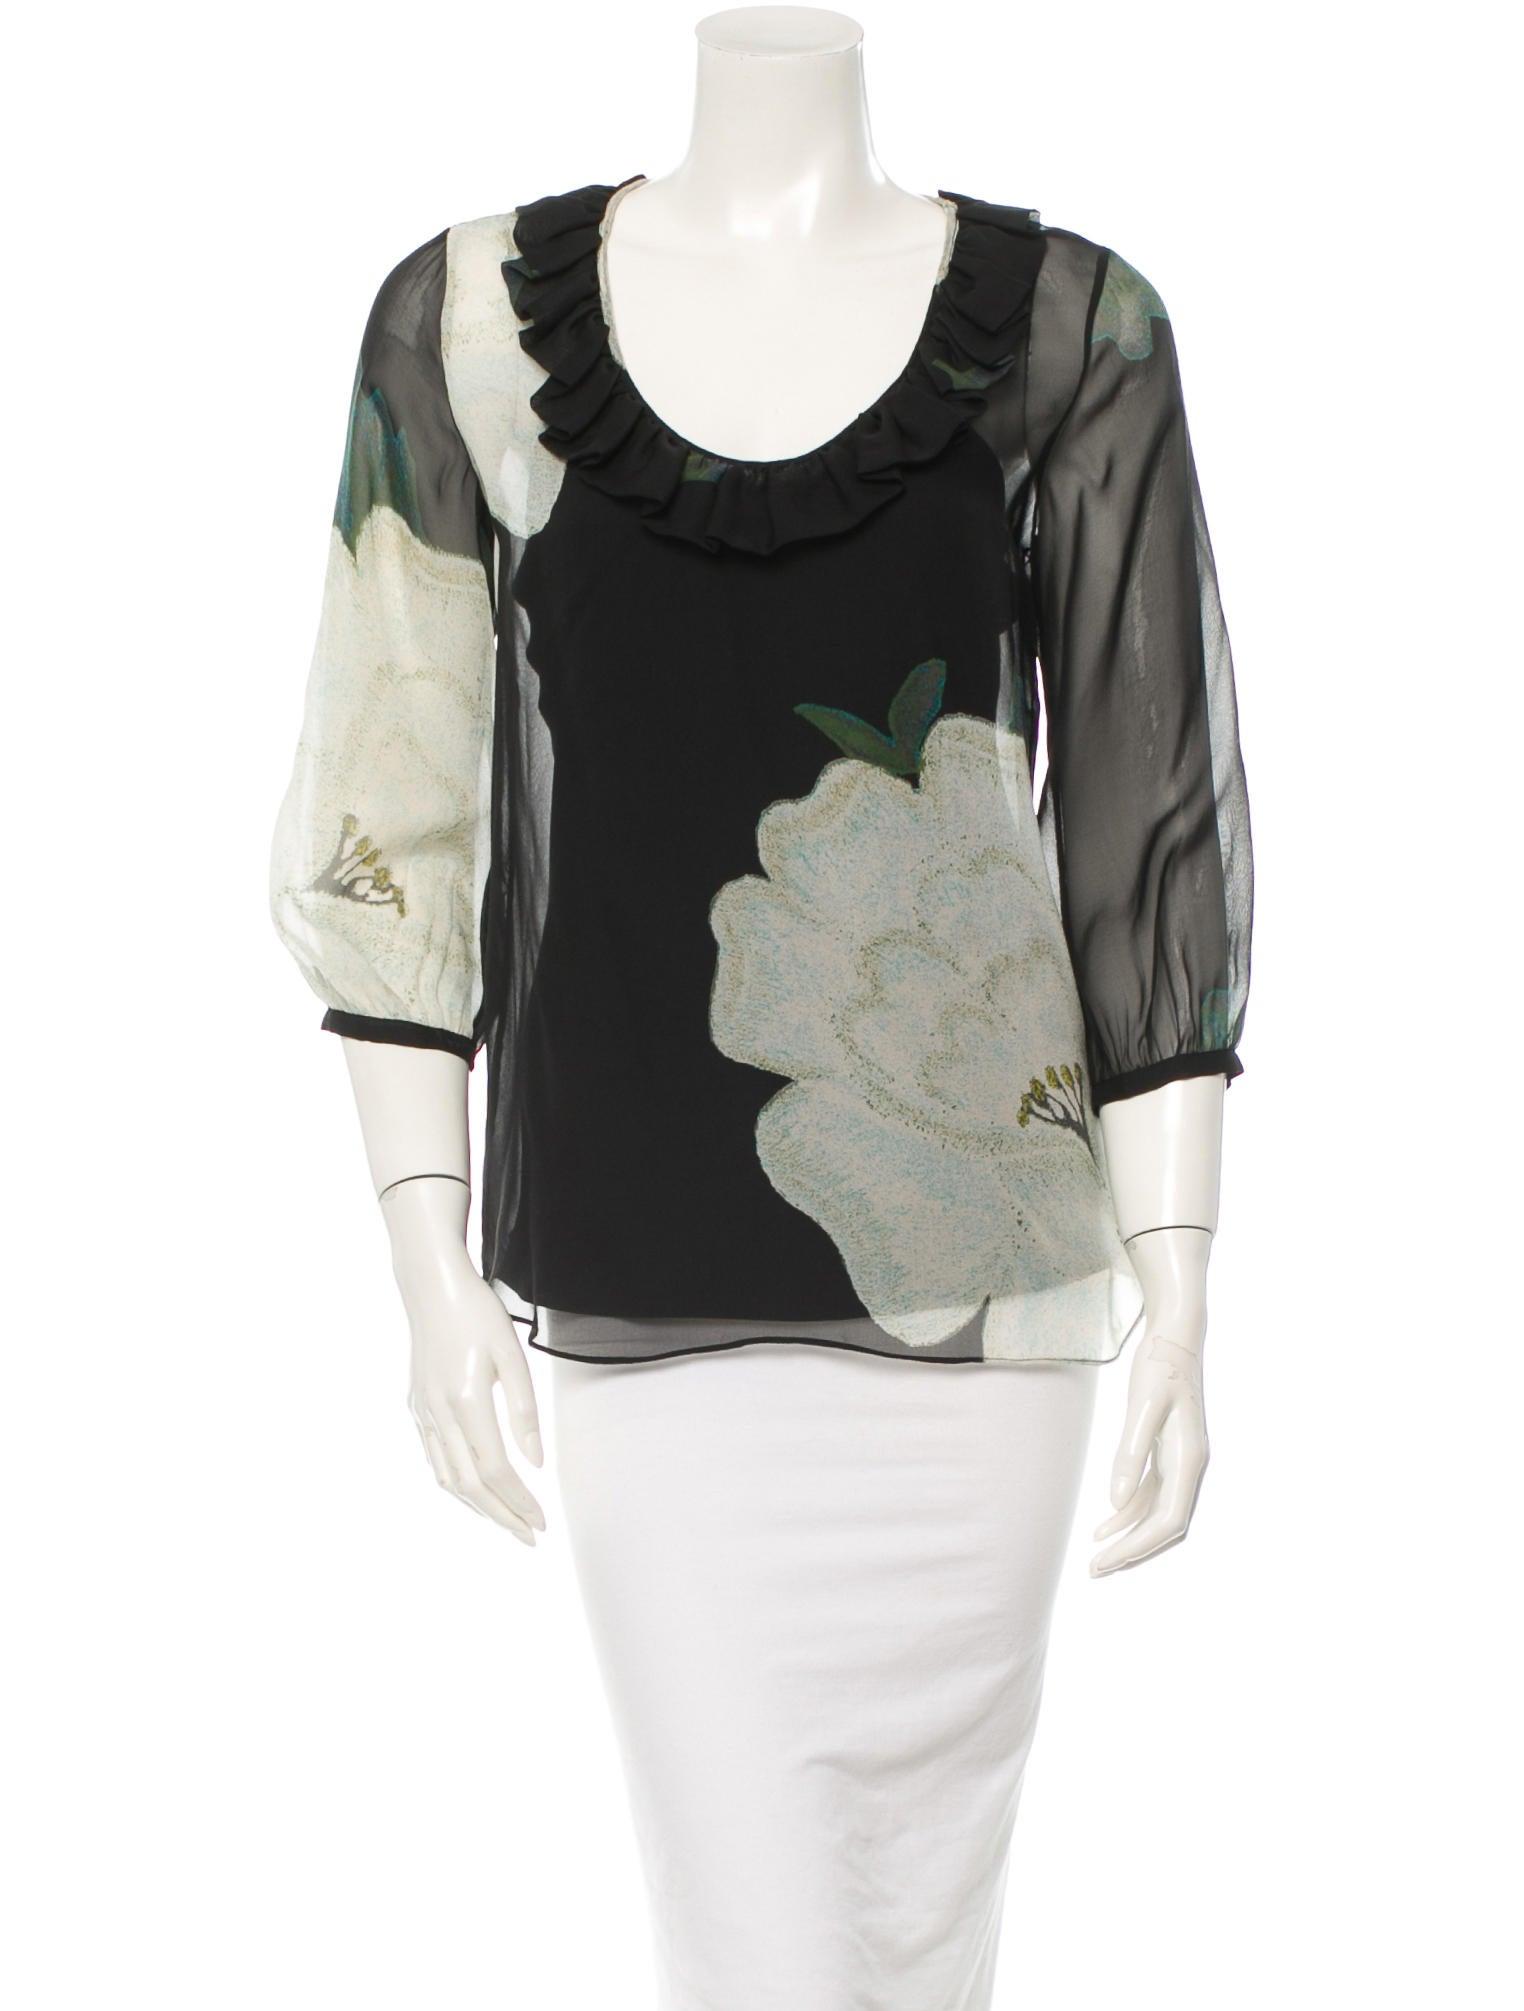 Diane von furstenberg blouse clothing wdi41941 the for Diane von furstenberg shirt